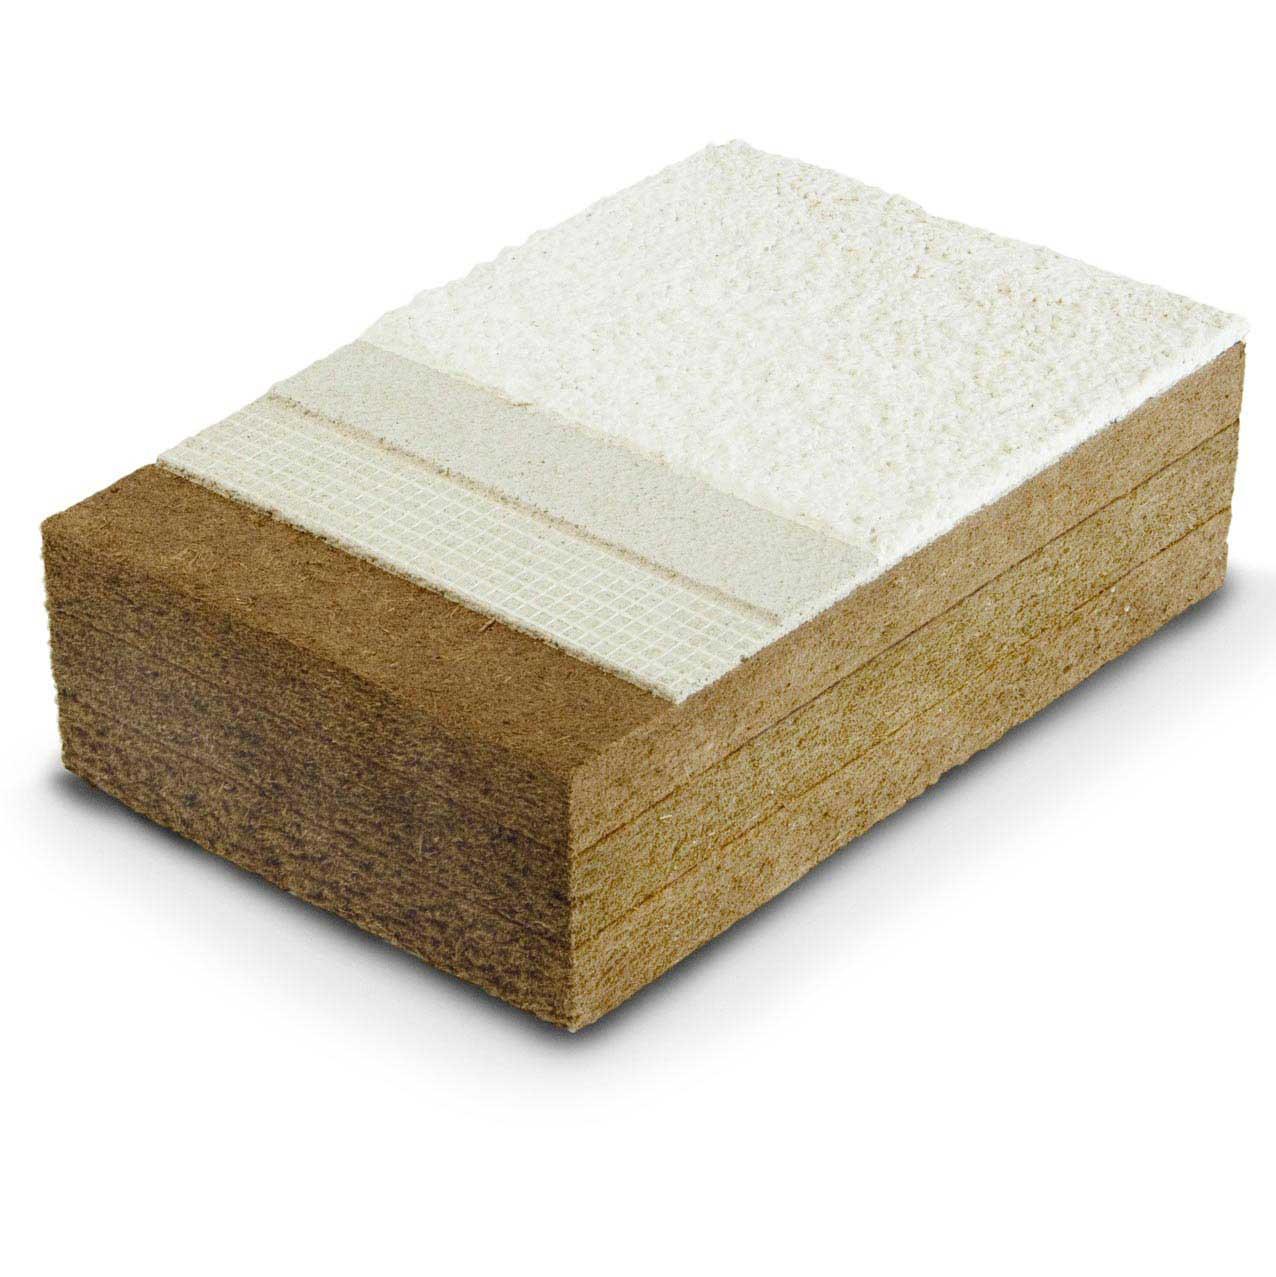 Data Sheets Fiber Wood Insulation